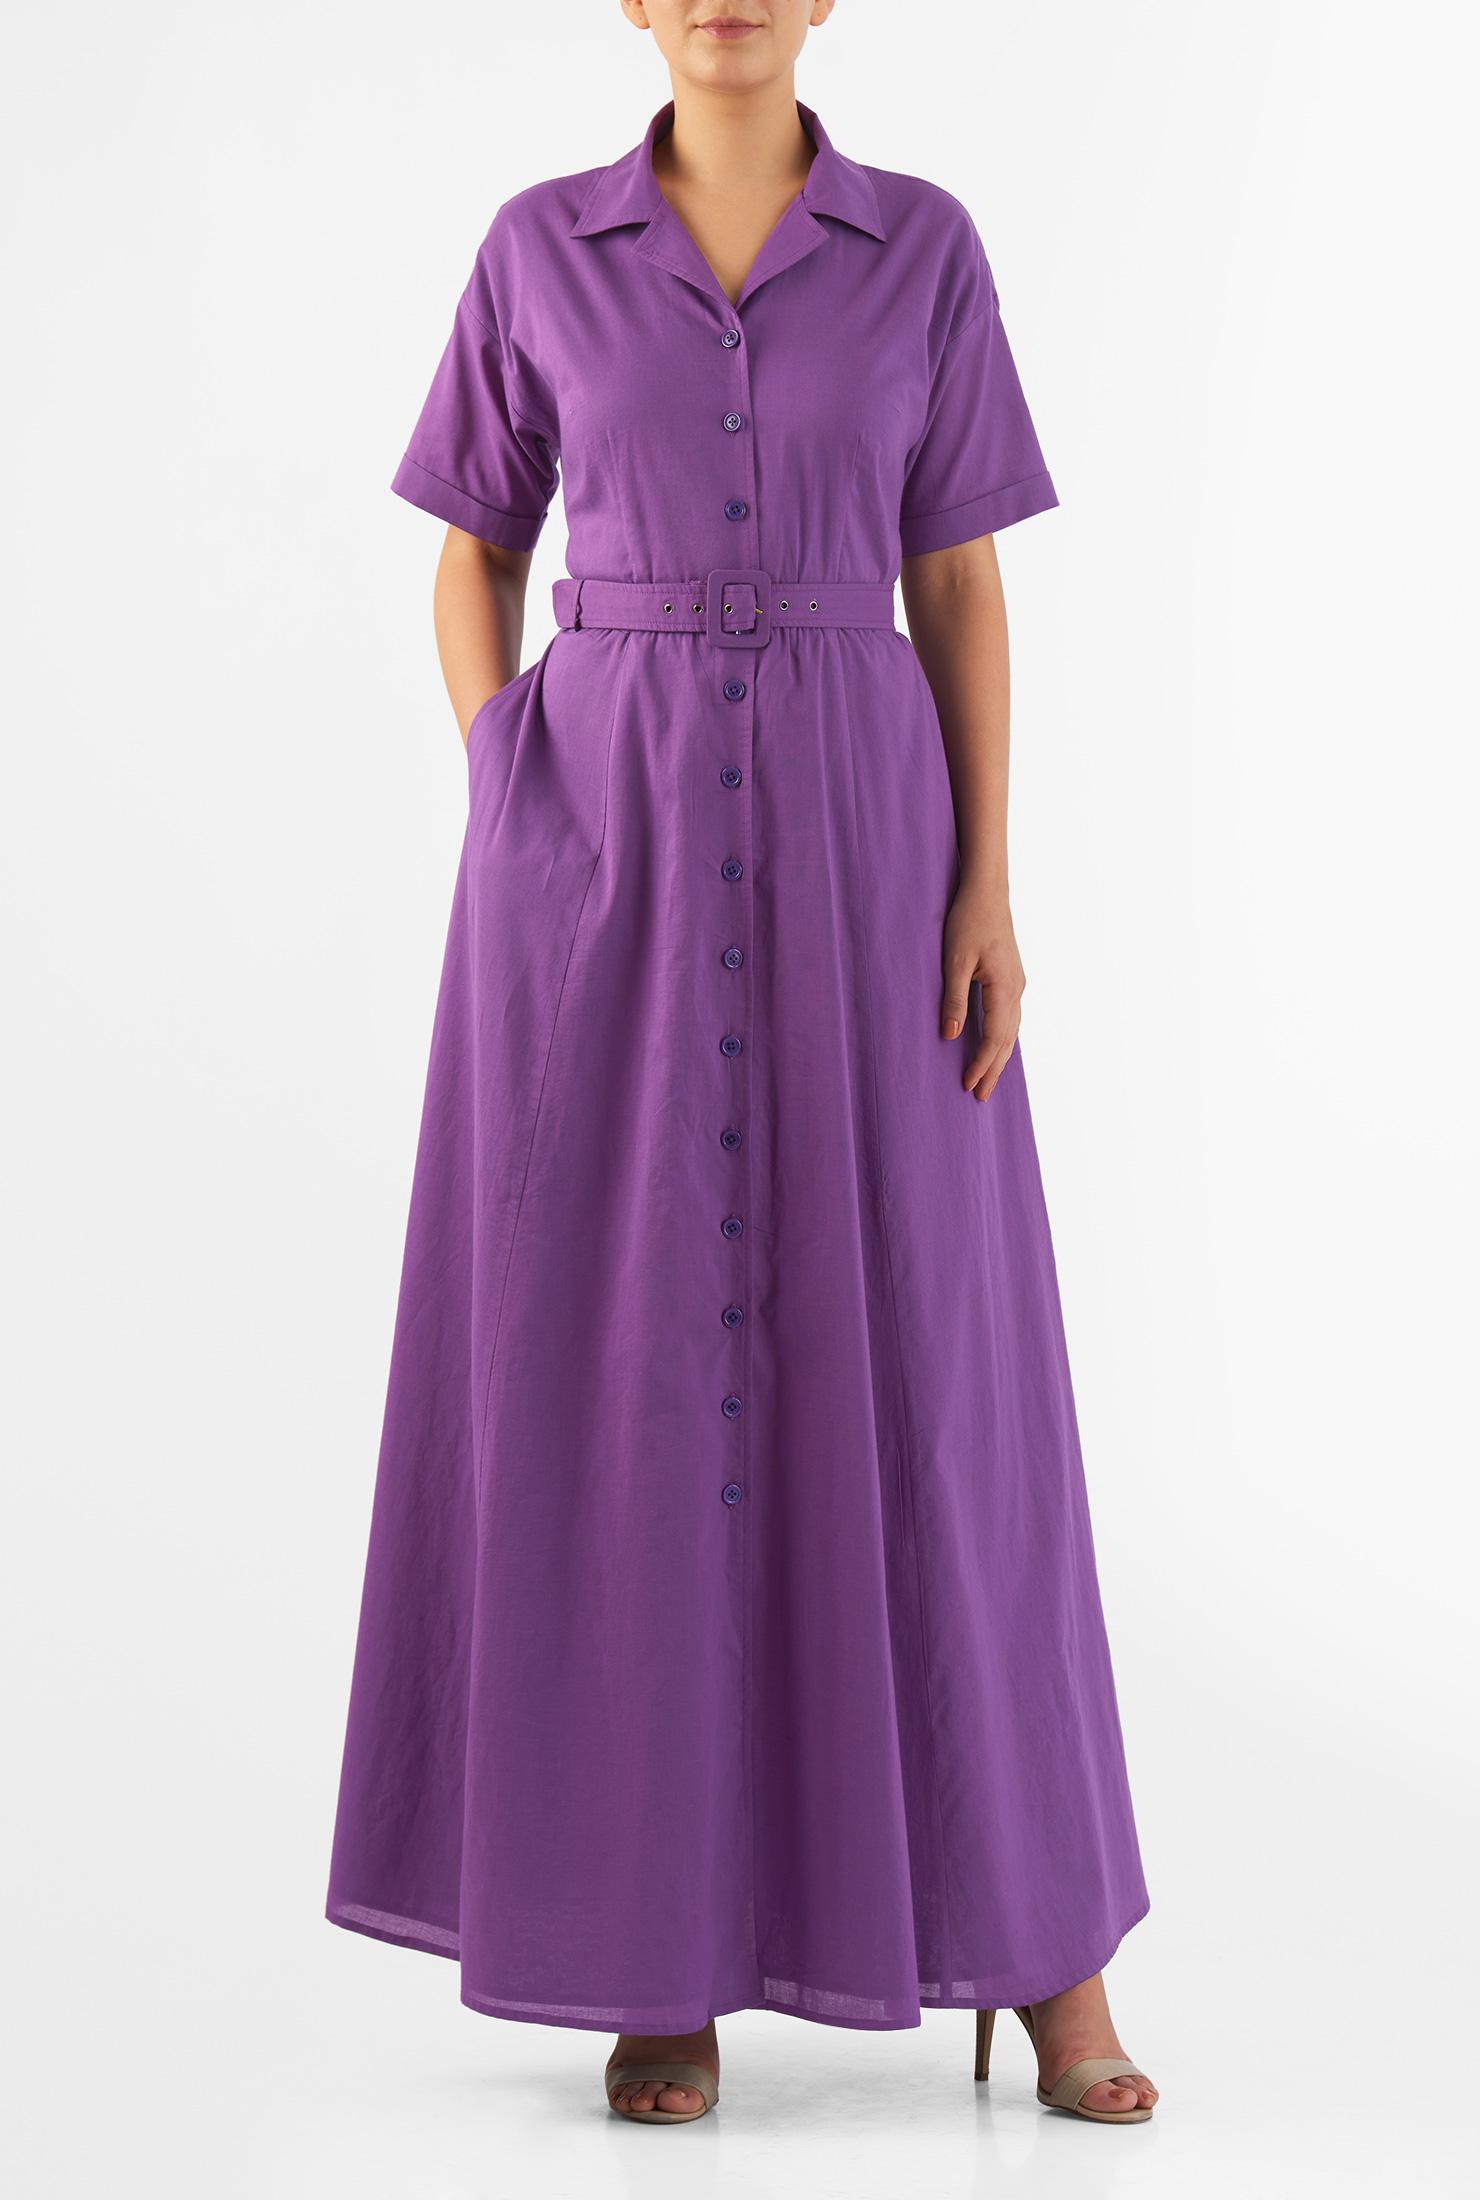 Eshakti Womens Drop Shoulder Cotton Cambric Maxi Shirtdress